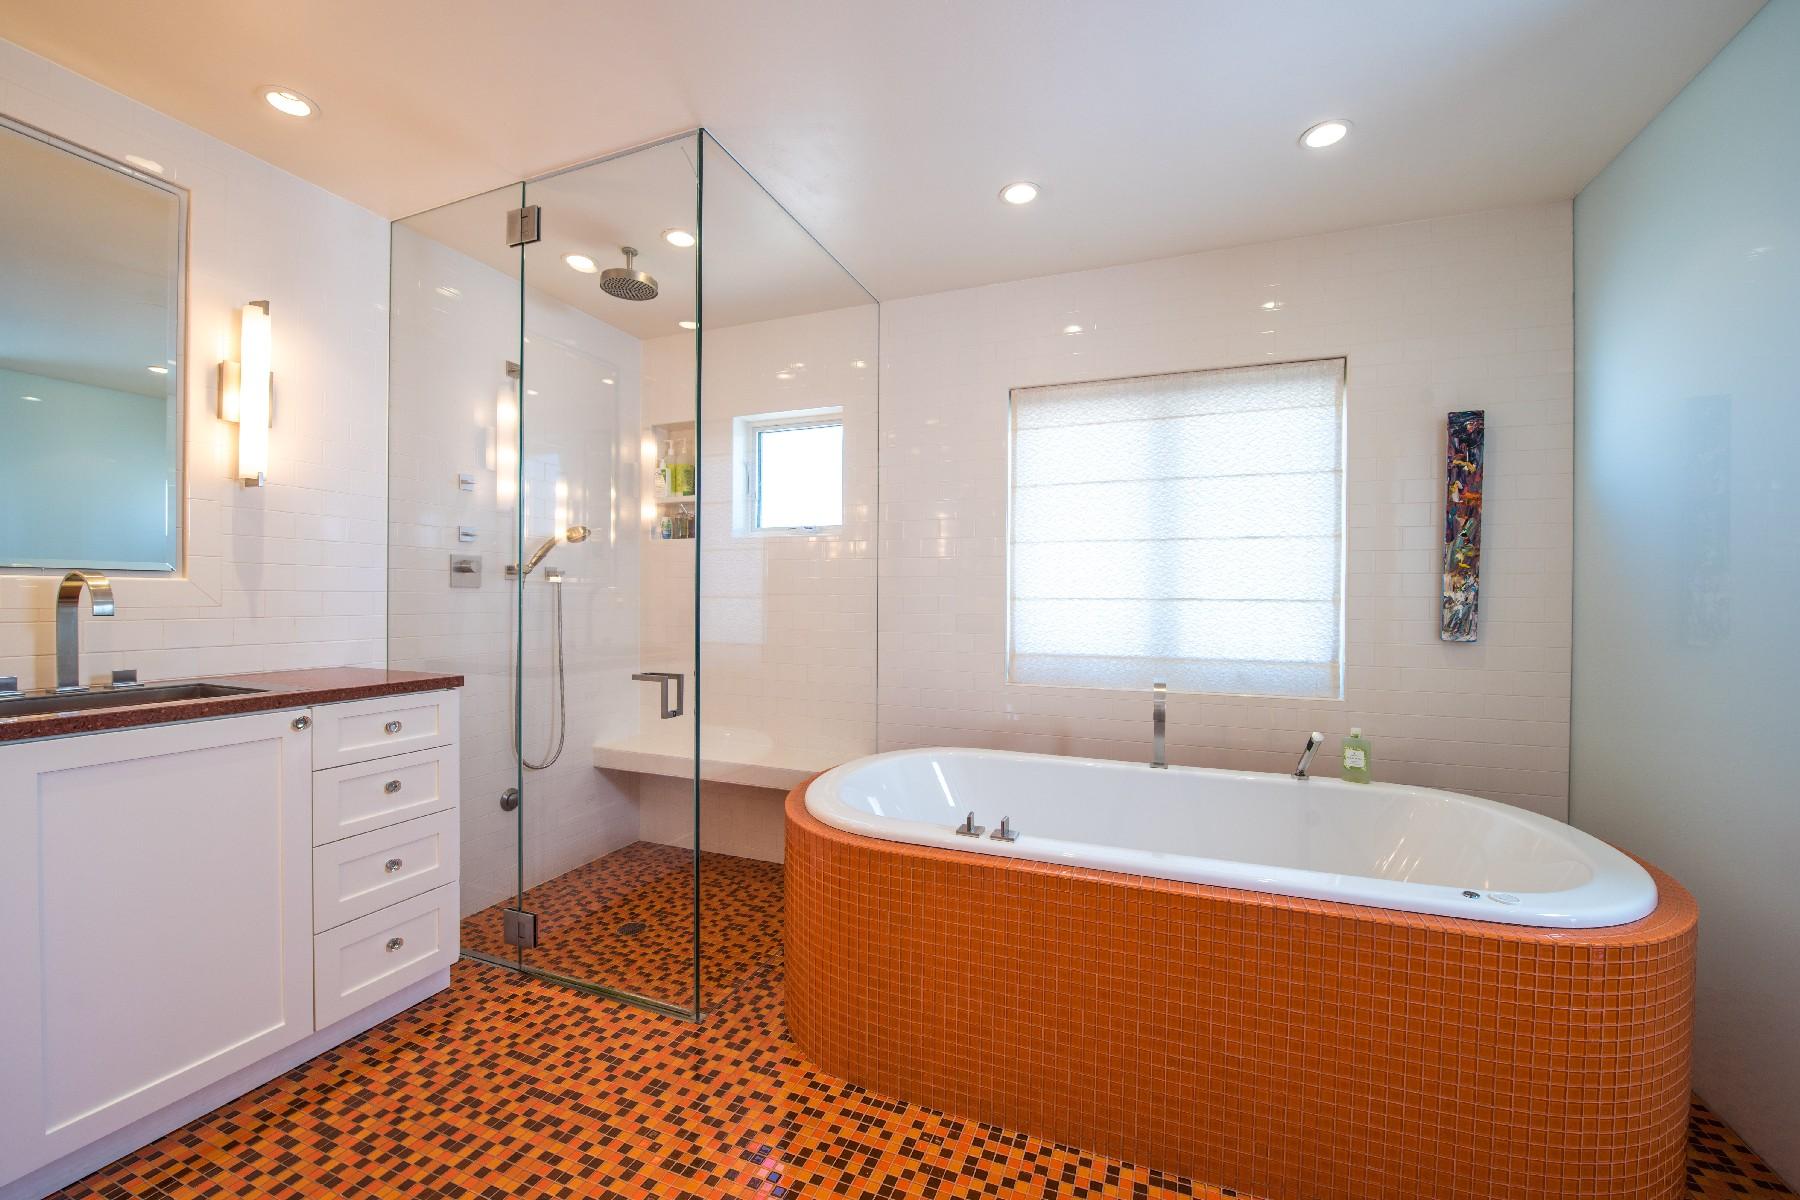 Additional photo for property listing at 734 Glorietta Boulevard 734 Glorietta Bouldevard 科罗纳多, 加利福尼亚州 92118 美国